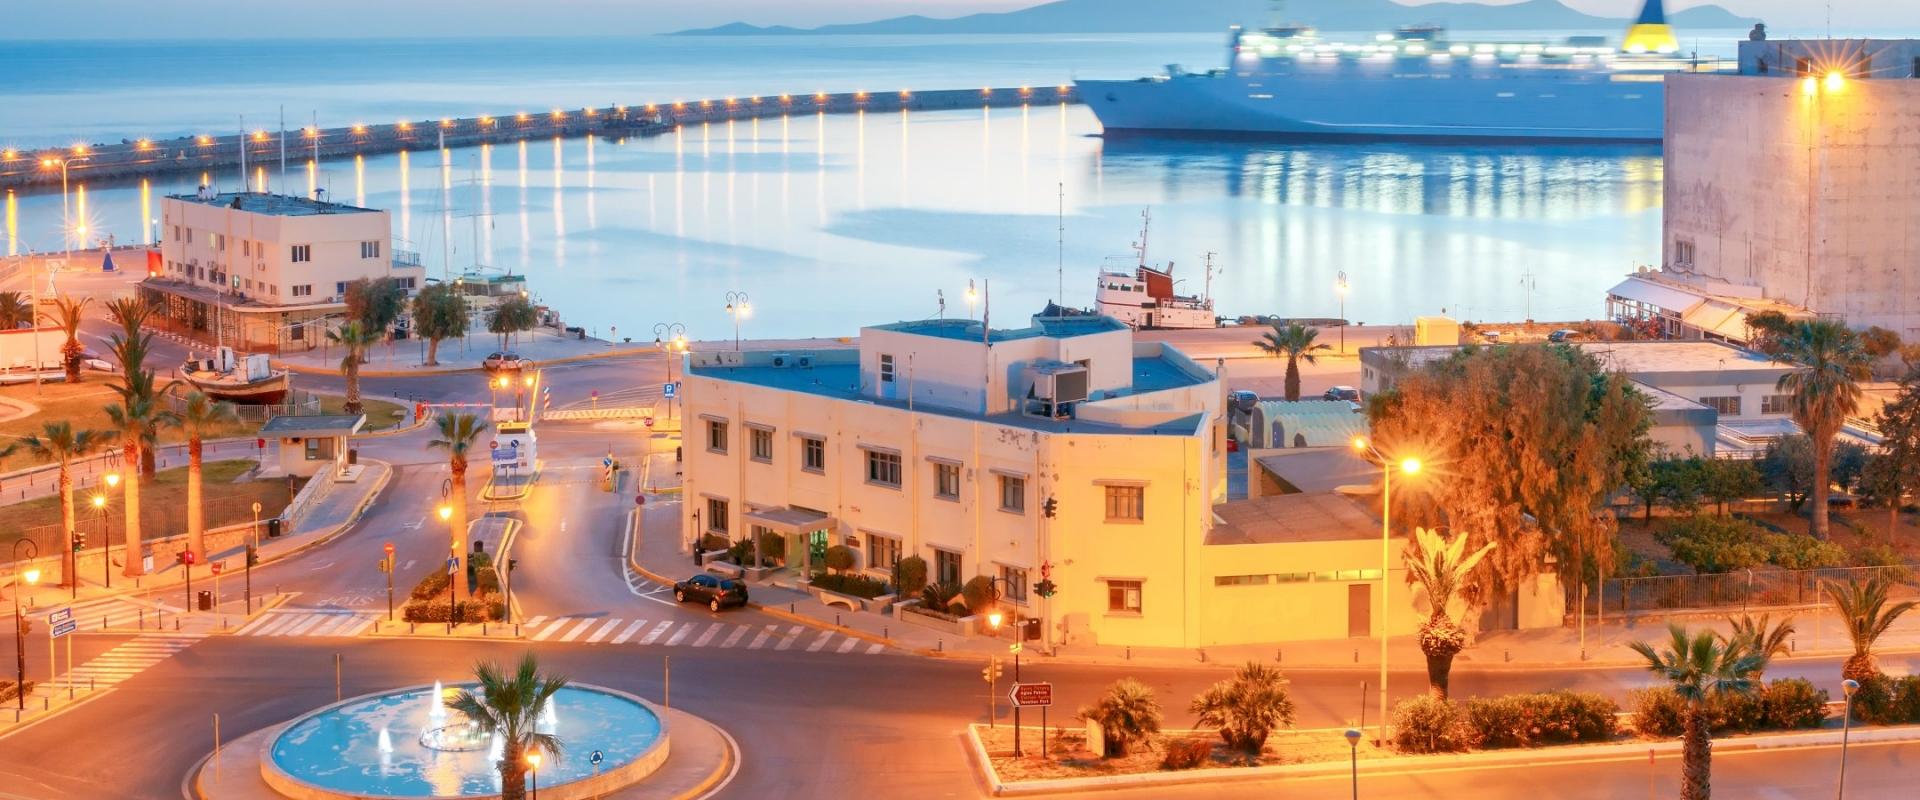 Heraklion. Sea port at sunrise in Crete